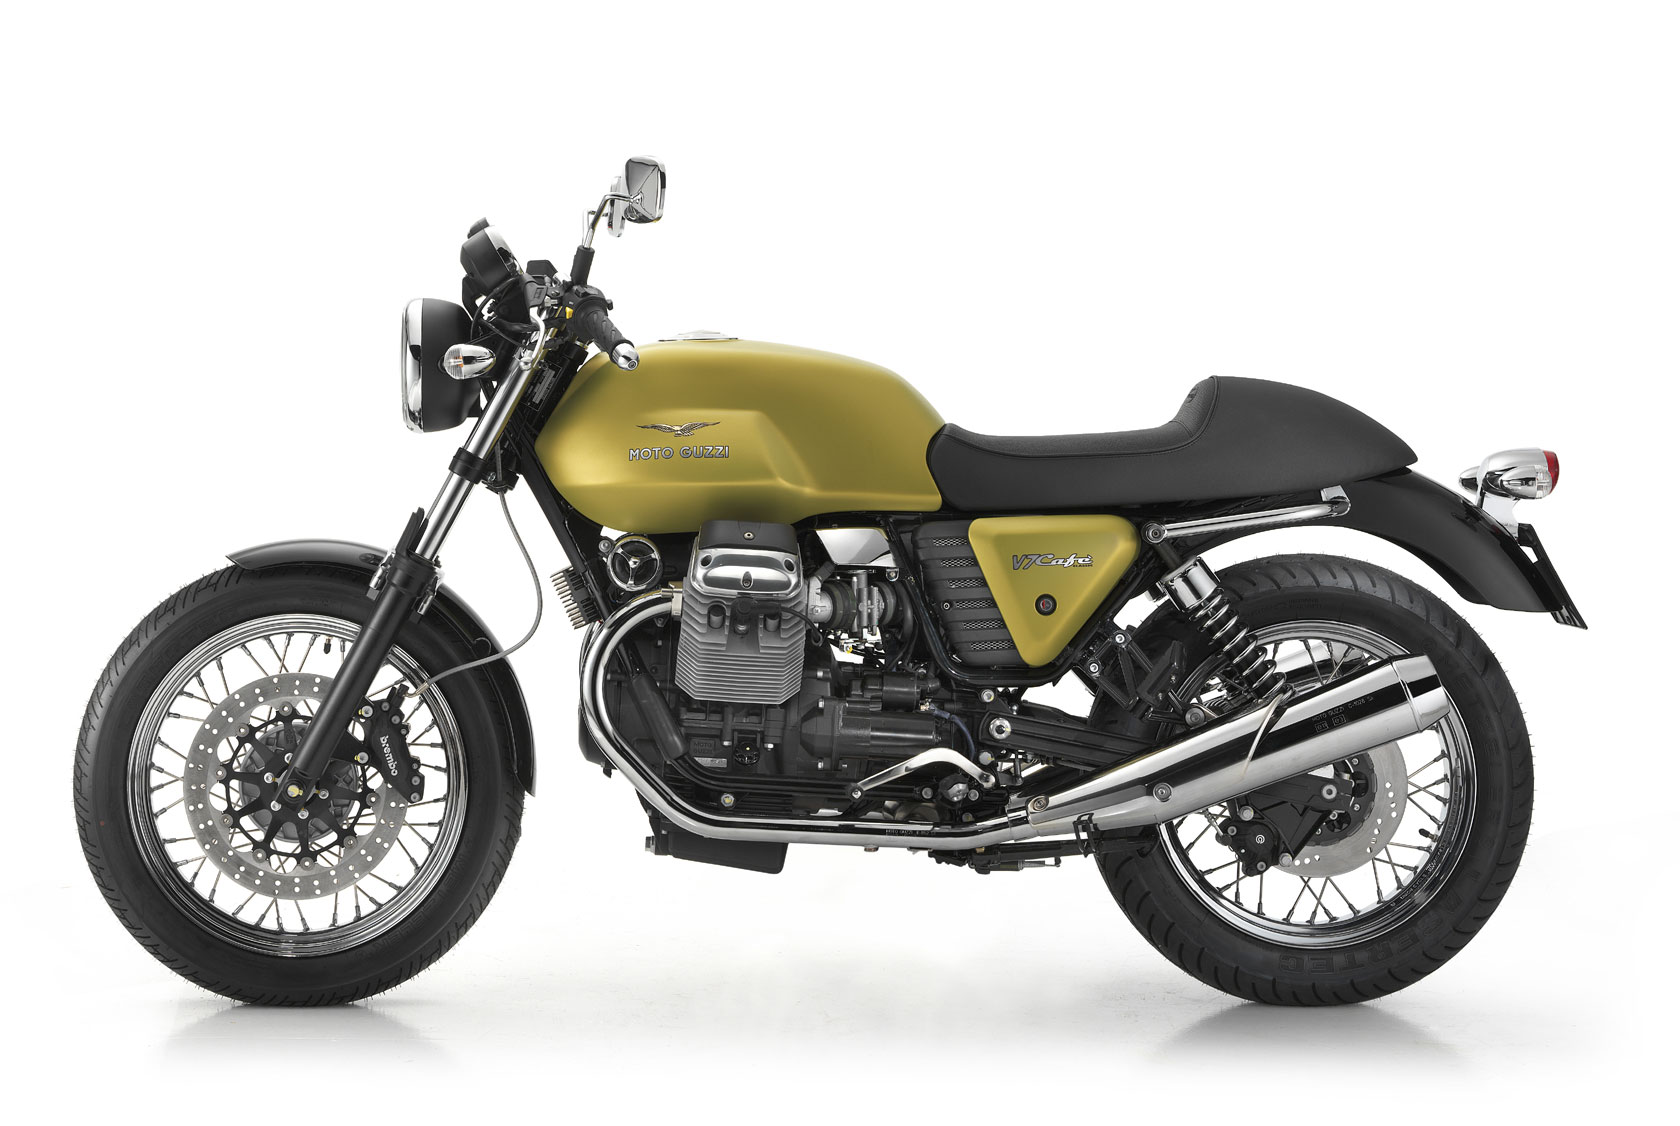 rides cars bikes motorcycles moto guzzi v7 cafe classic